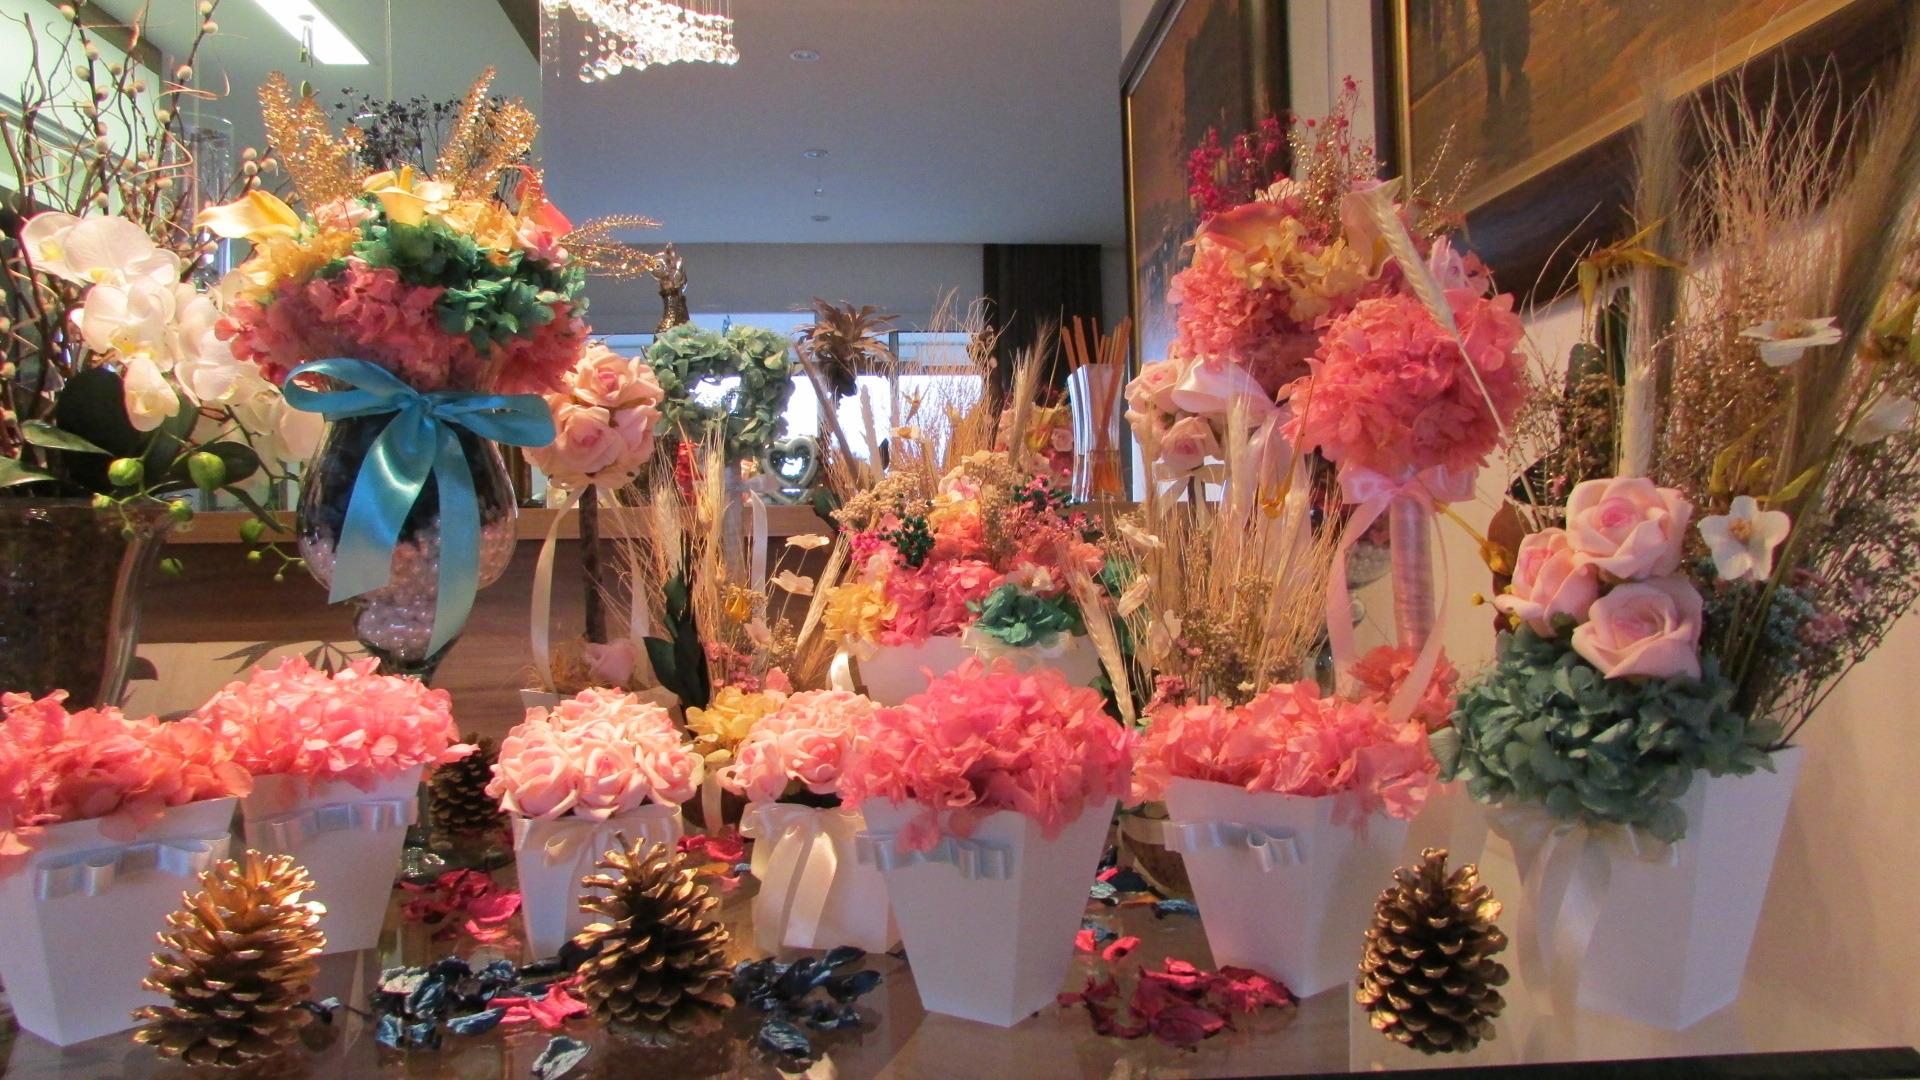 decoracao de jardim para festa infantil:kit-festa-jardim-encantado-i-decoracao-noivado kit-festa-jardim